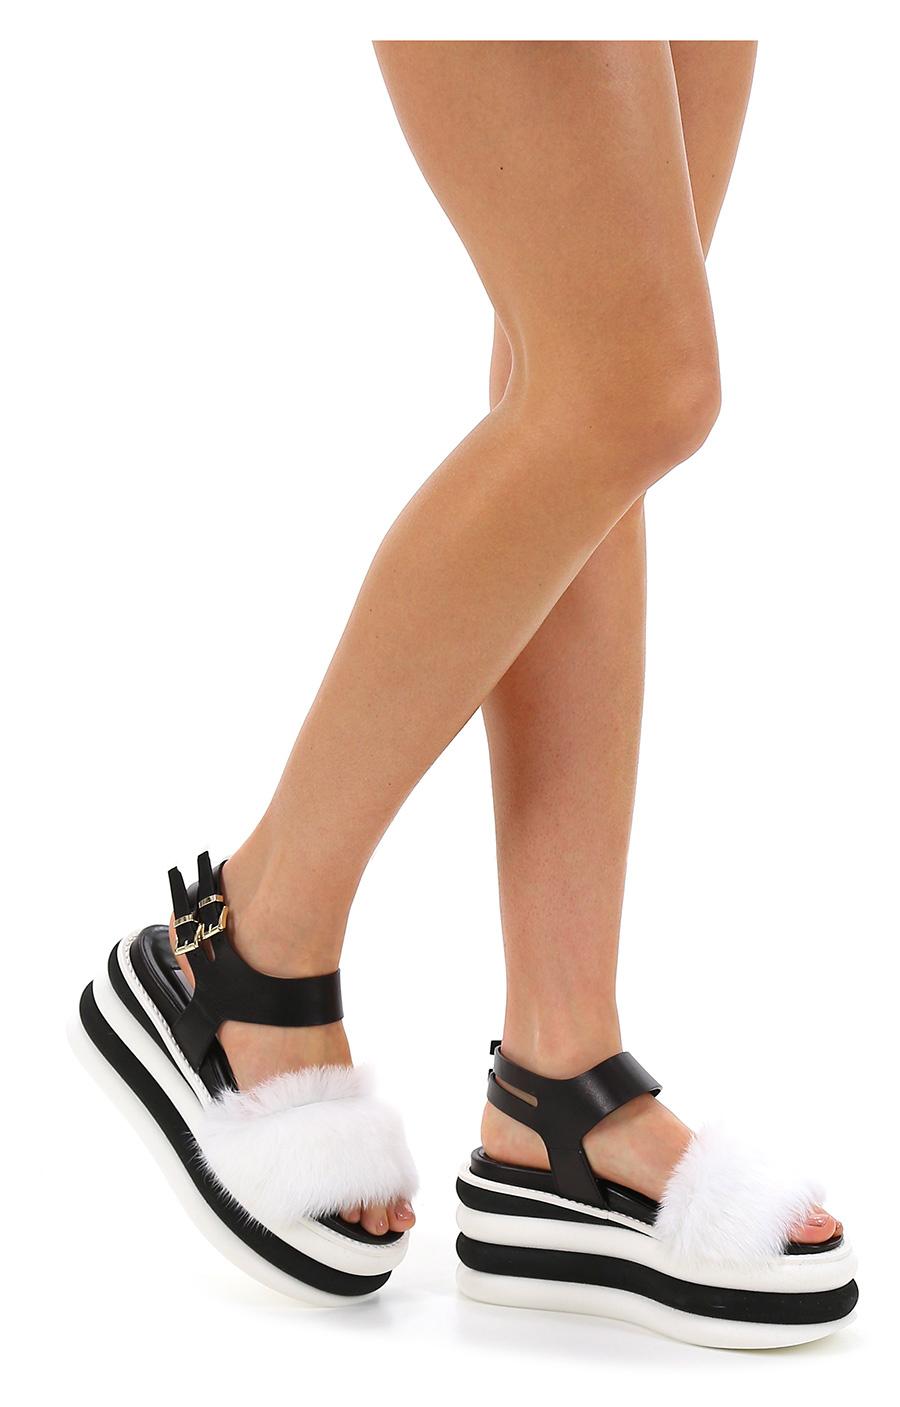 Zeppa Nero/bianco Giampaolo Viozzi Verschleißfeste billige Schuhe